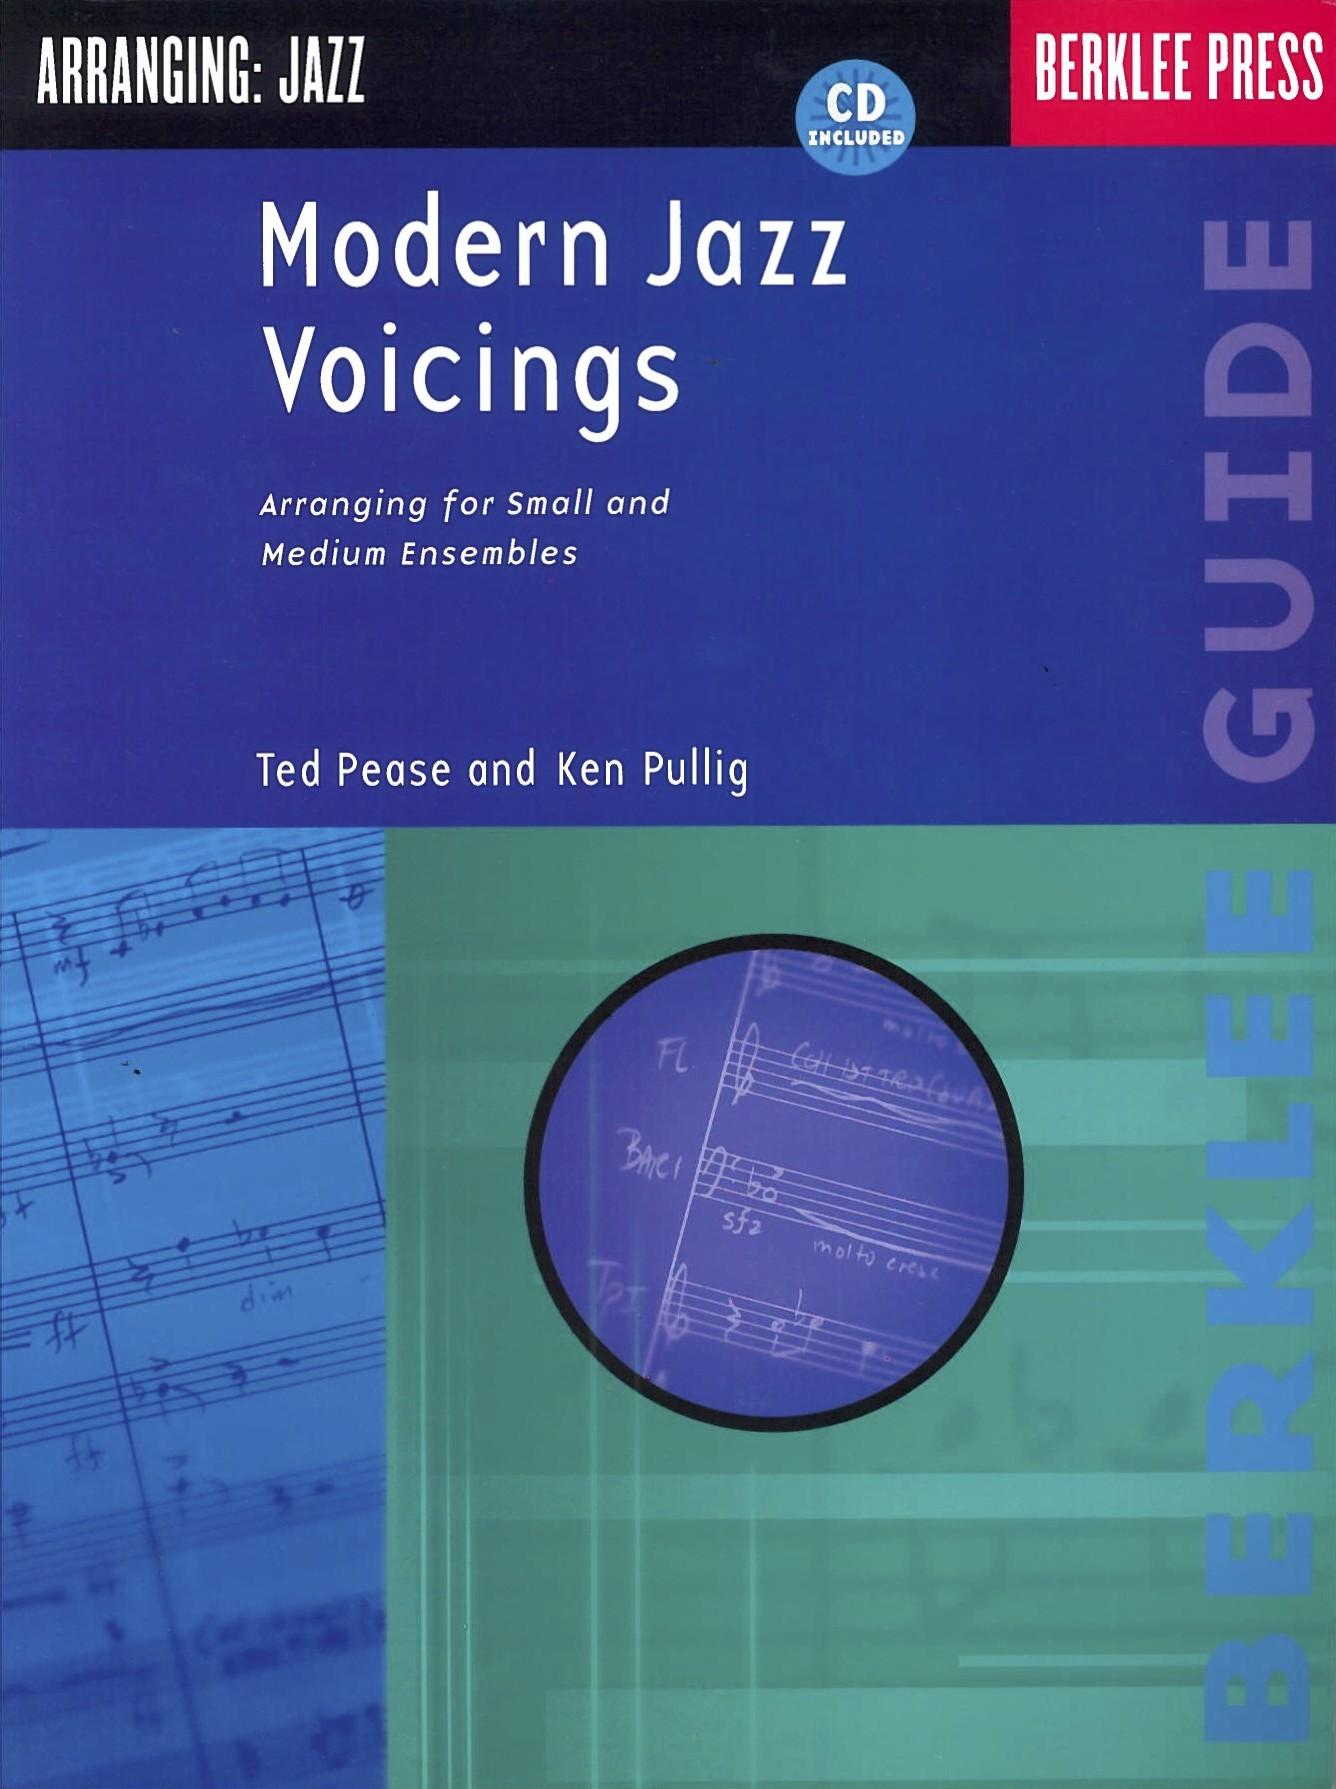 Arranging and Composing - Berklee Press